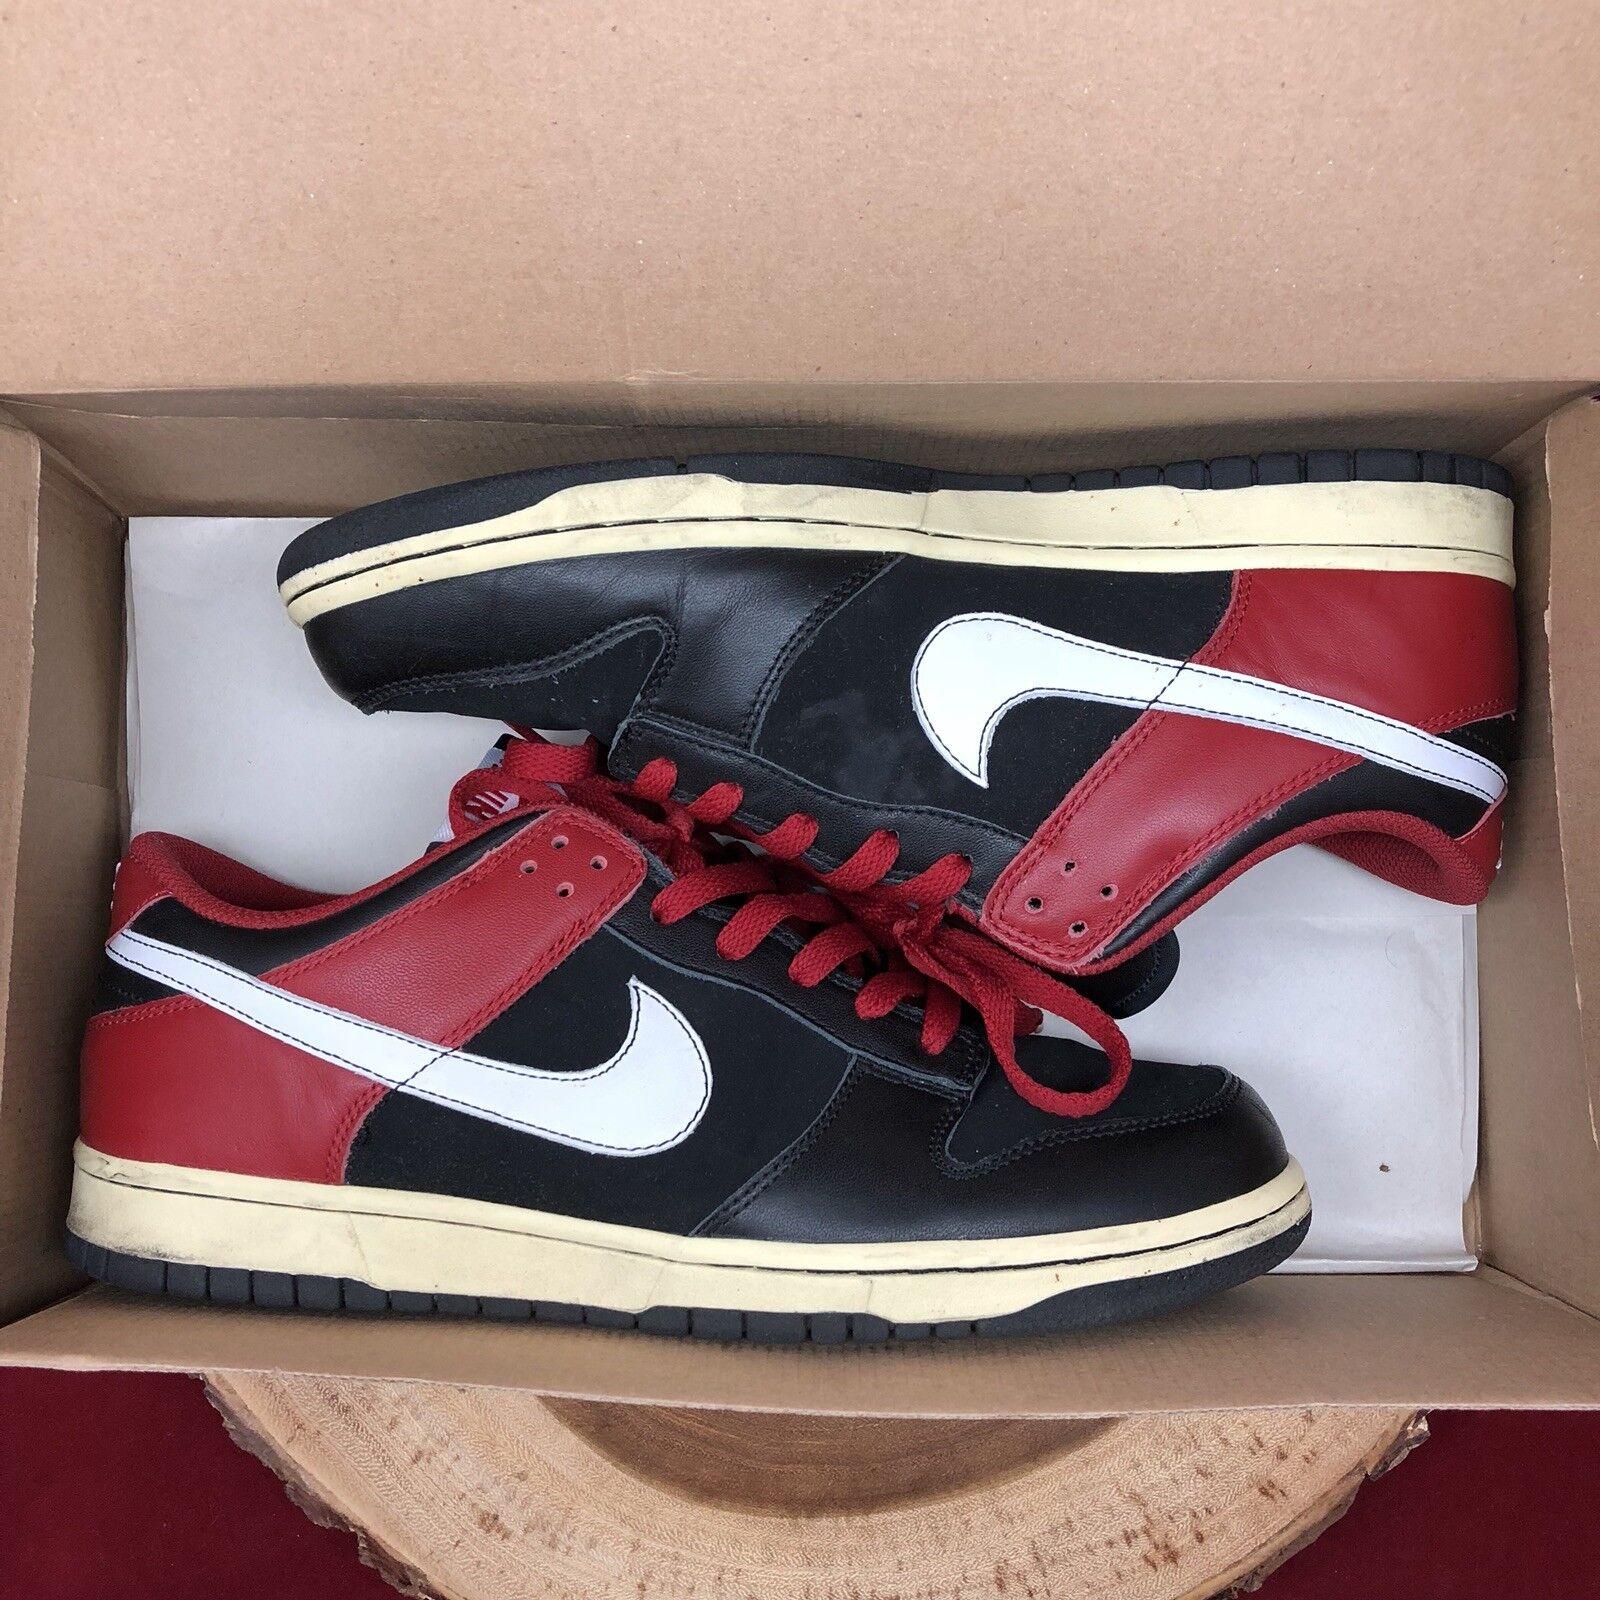 Nike Dunk Low CL Jordan Bred Black Red Size 10.5 304714 016 VI III I XI SB